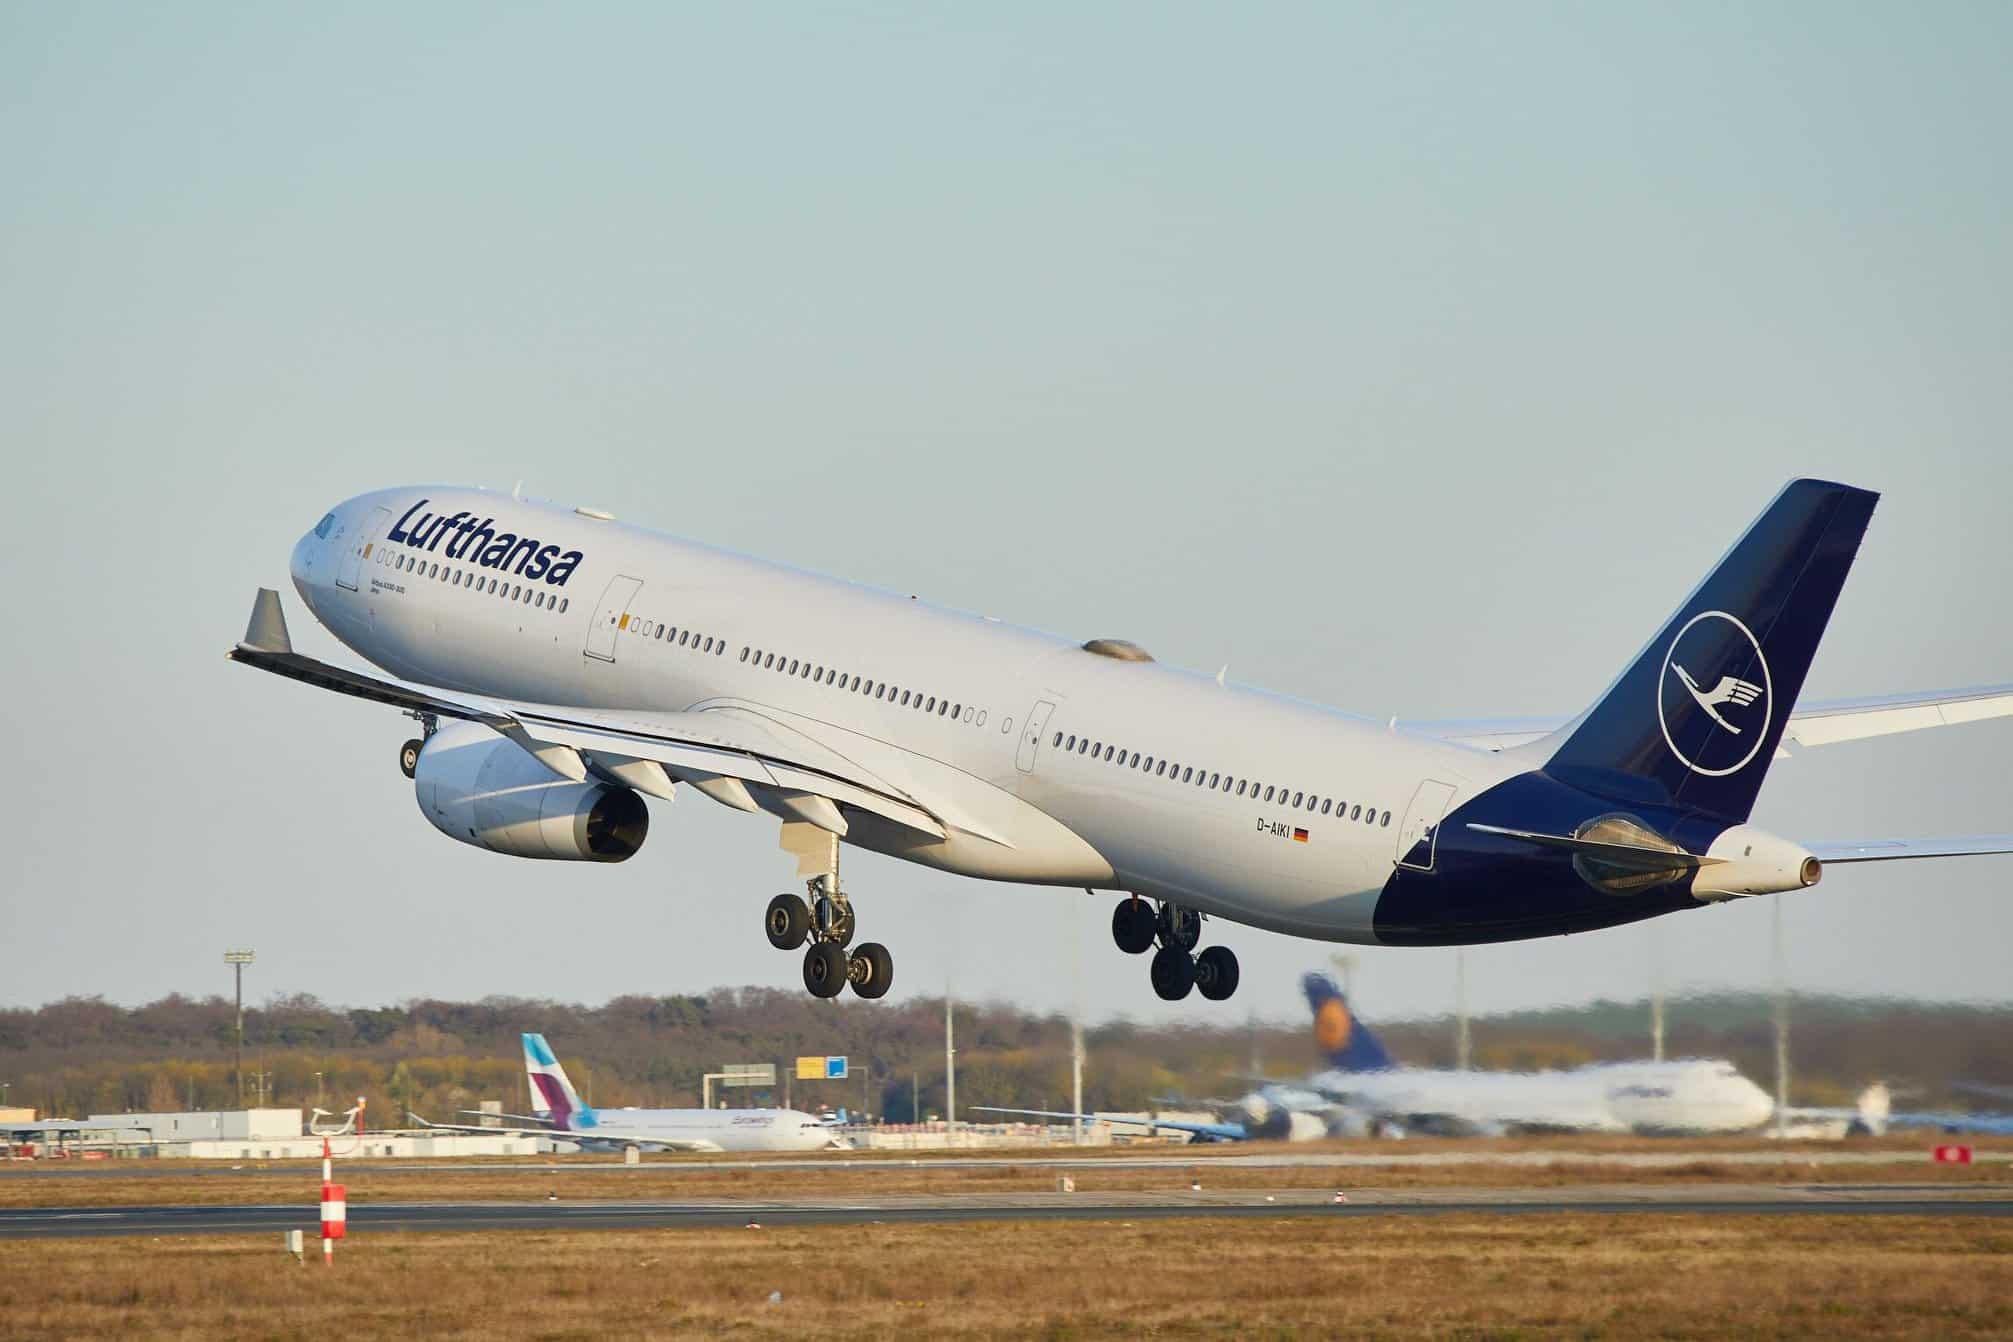 Lufthansa adds more European destinations from Munich Airport